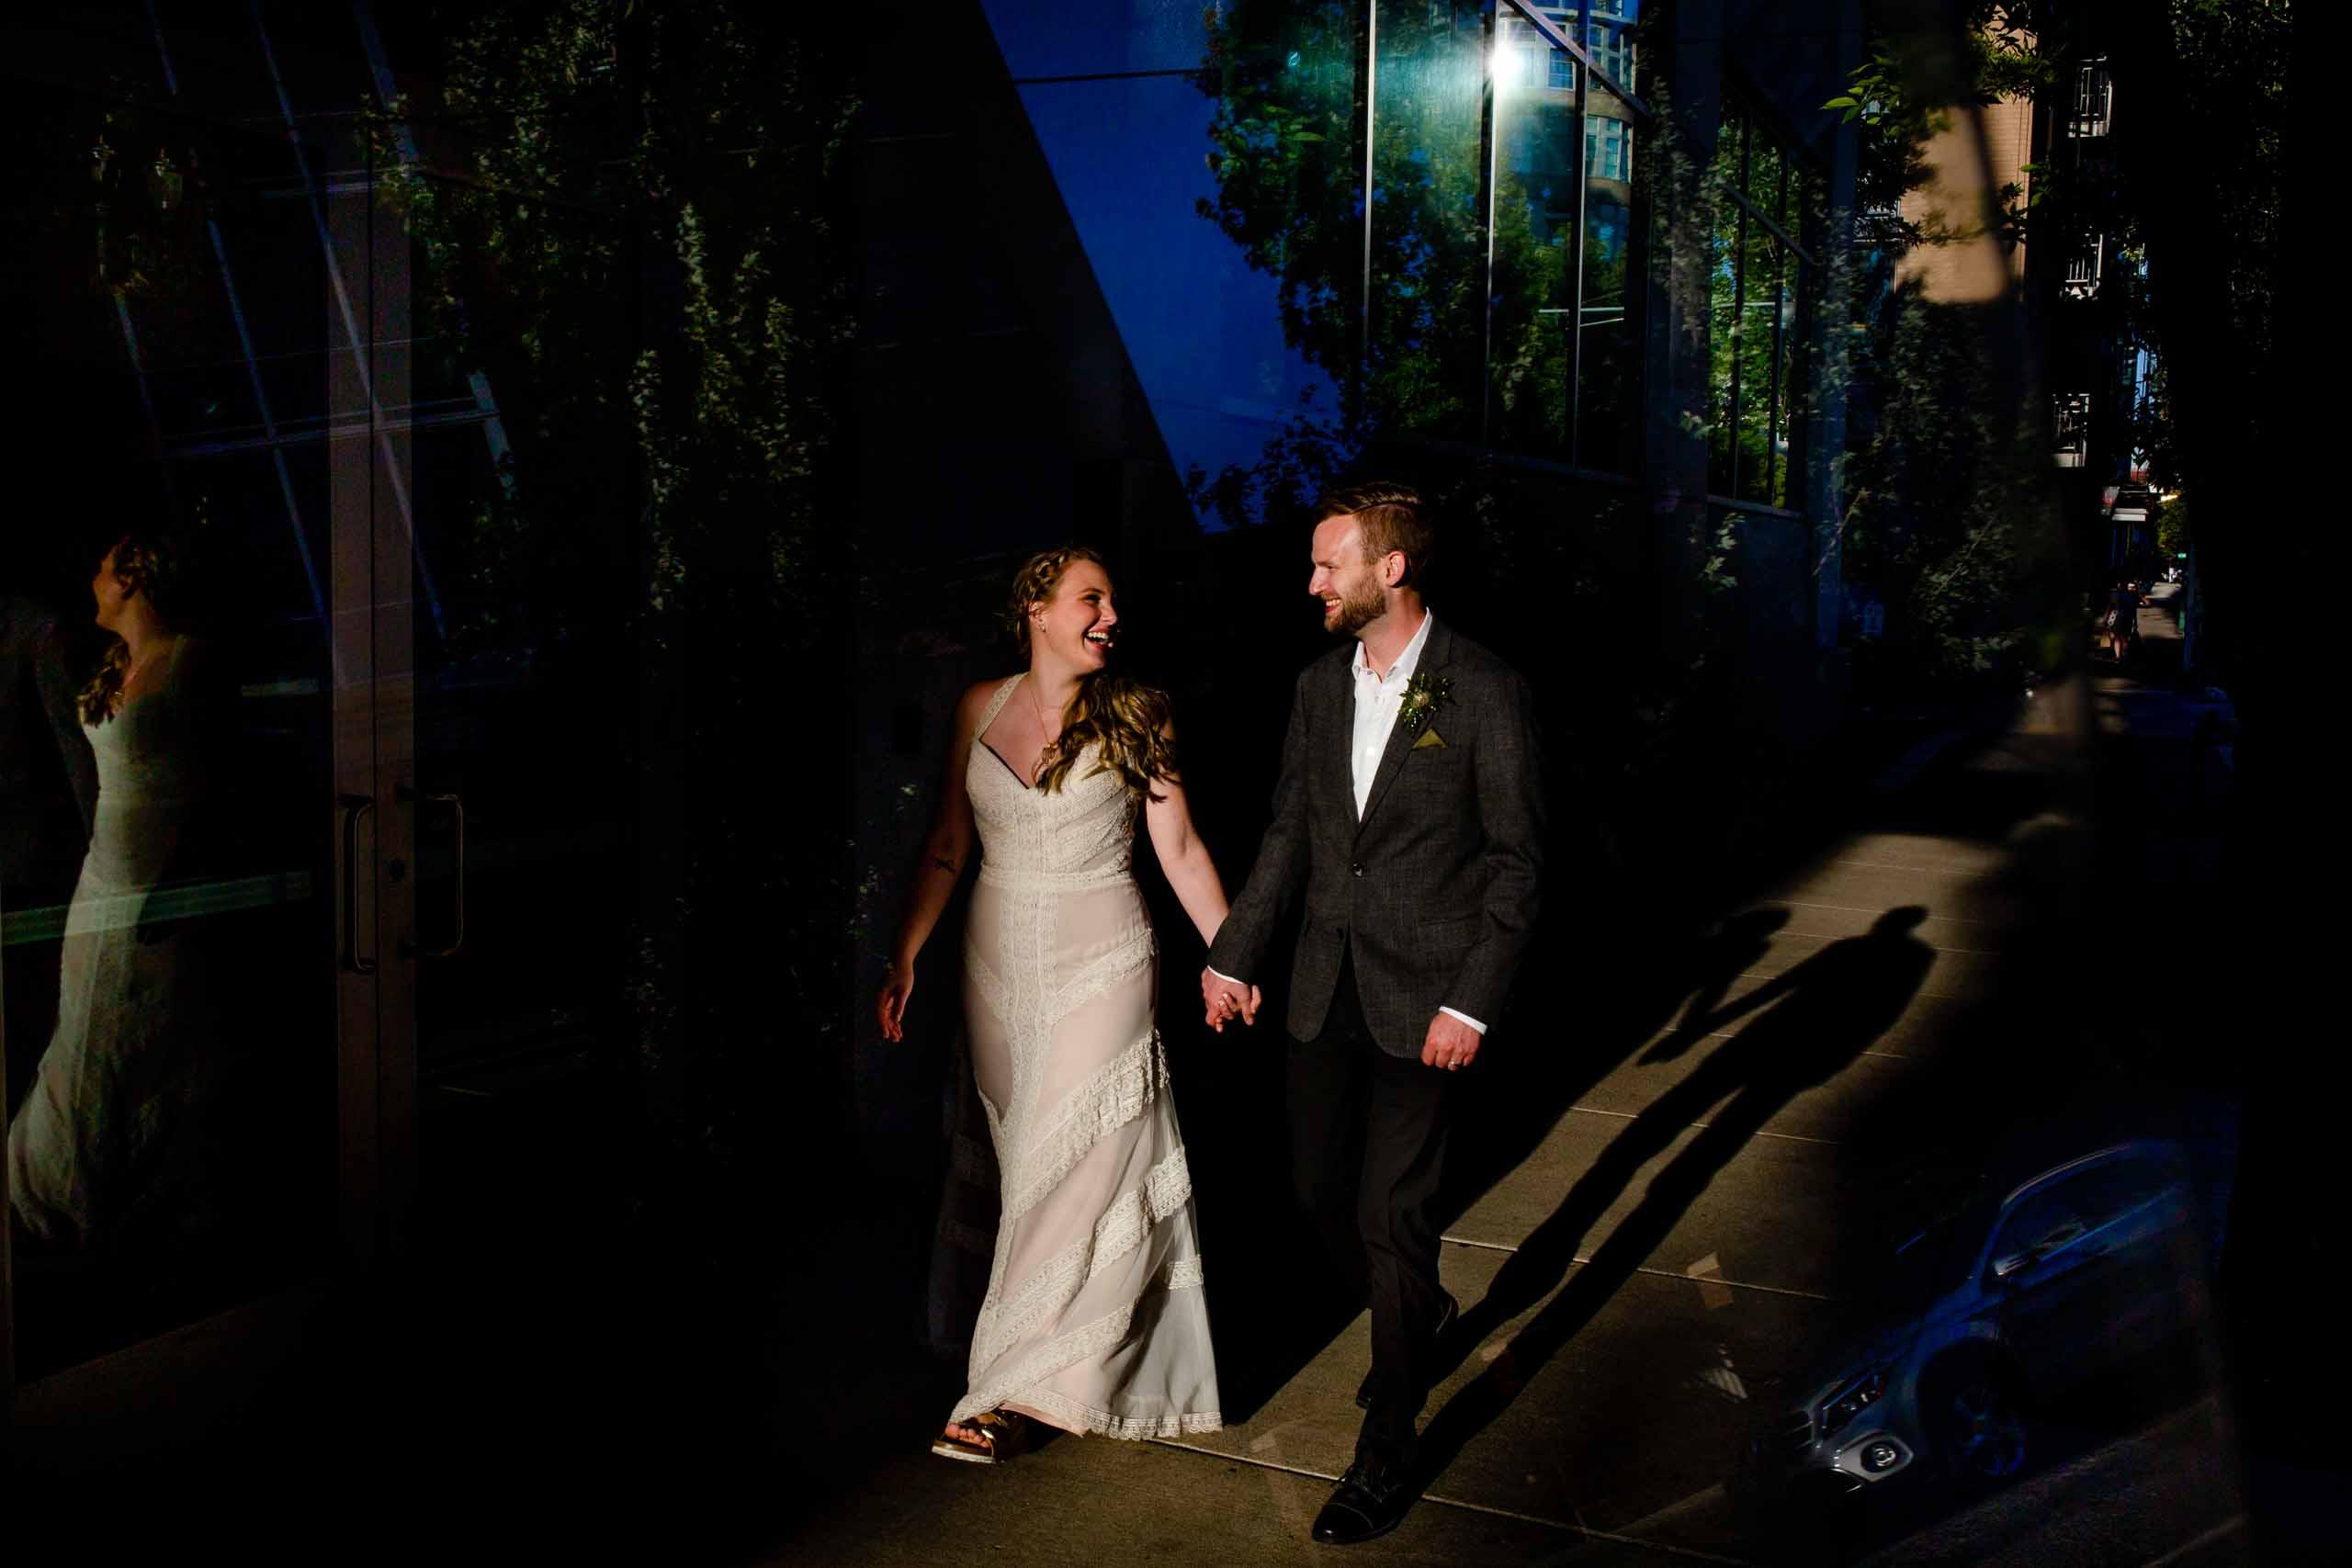 Fun photo of bride and groom walking through Portland streets following their Mt Hood Meadows wedding at Umbrella Falls